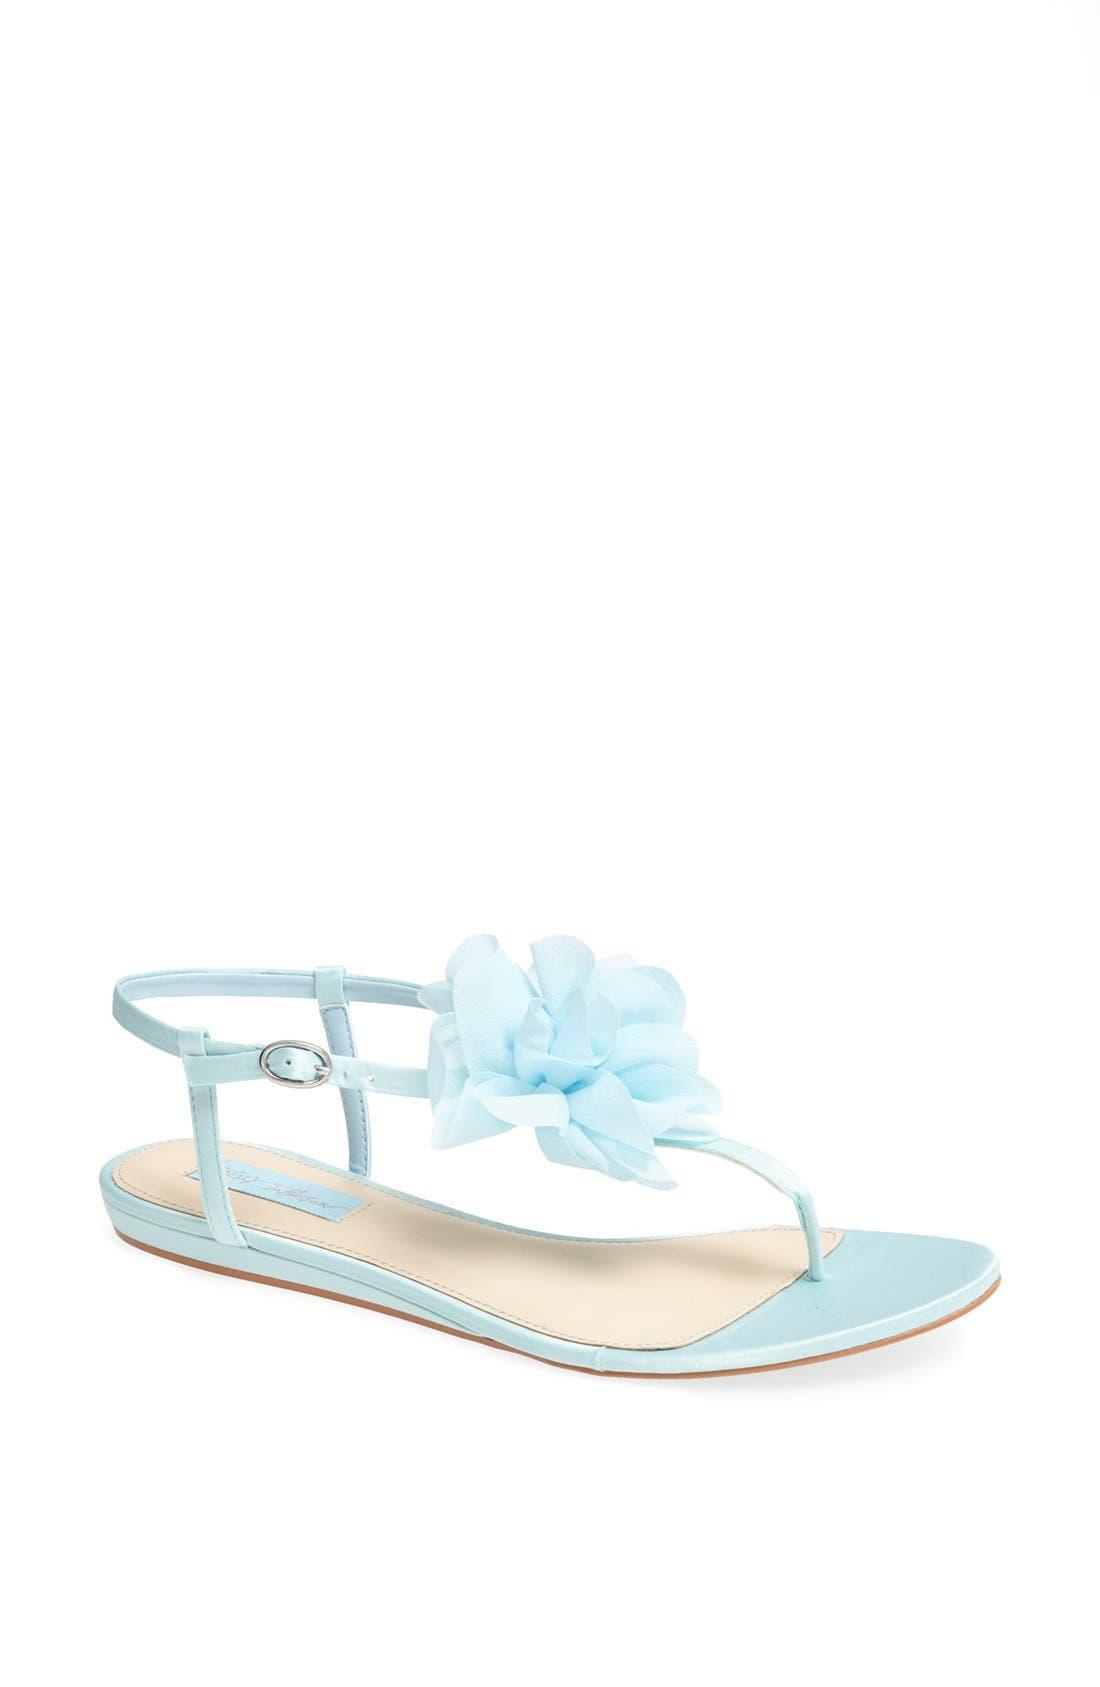 Main Image - Blue by Betsey Johnson 'Iris' Thong Sandal